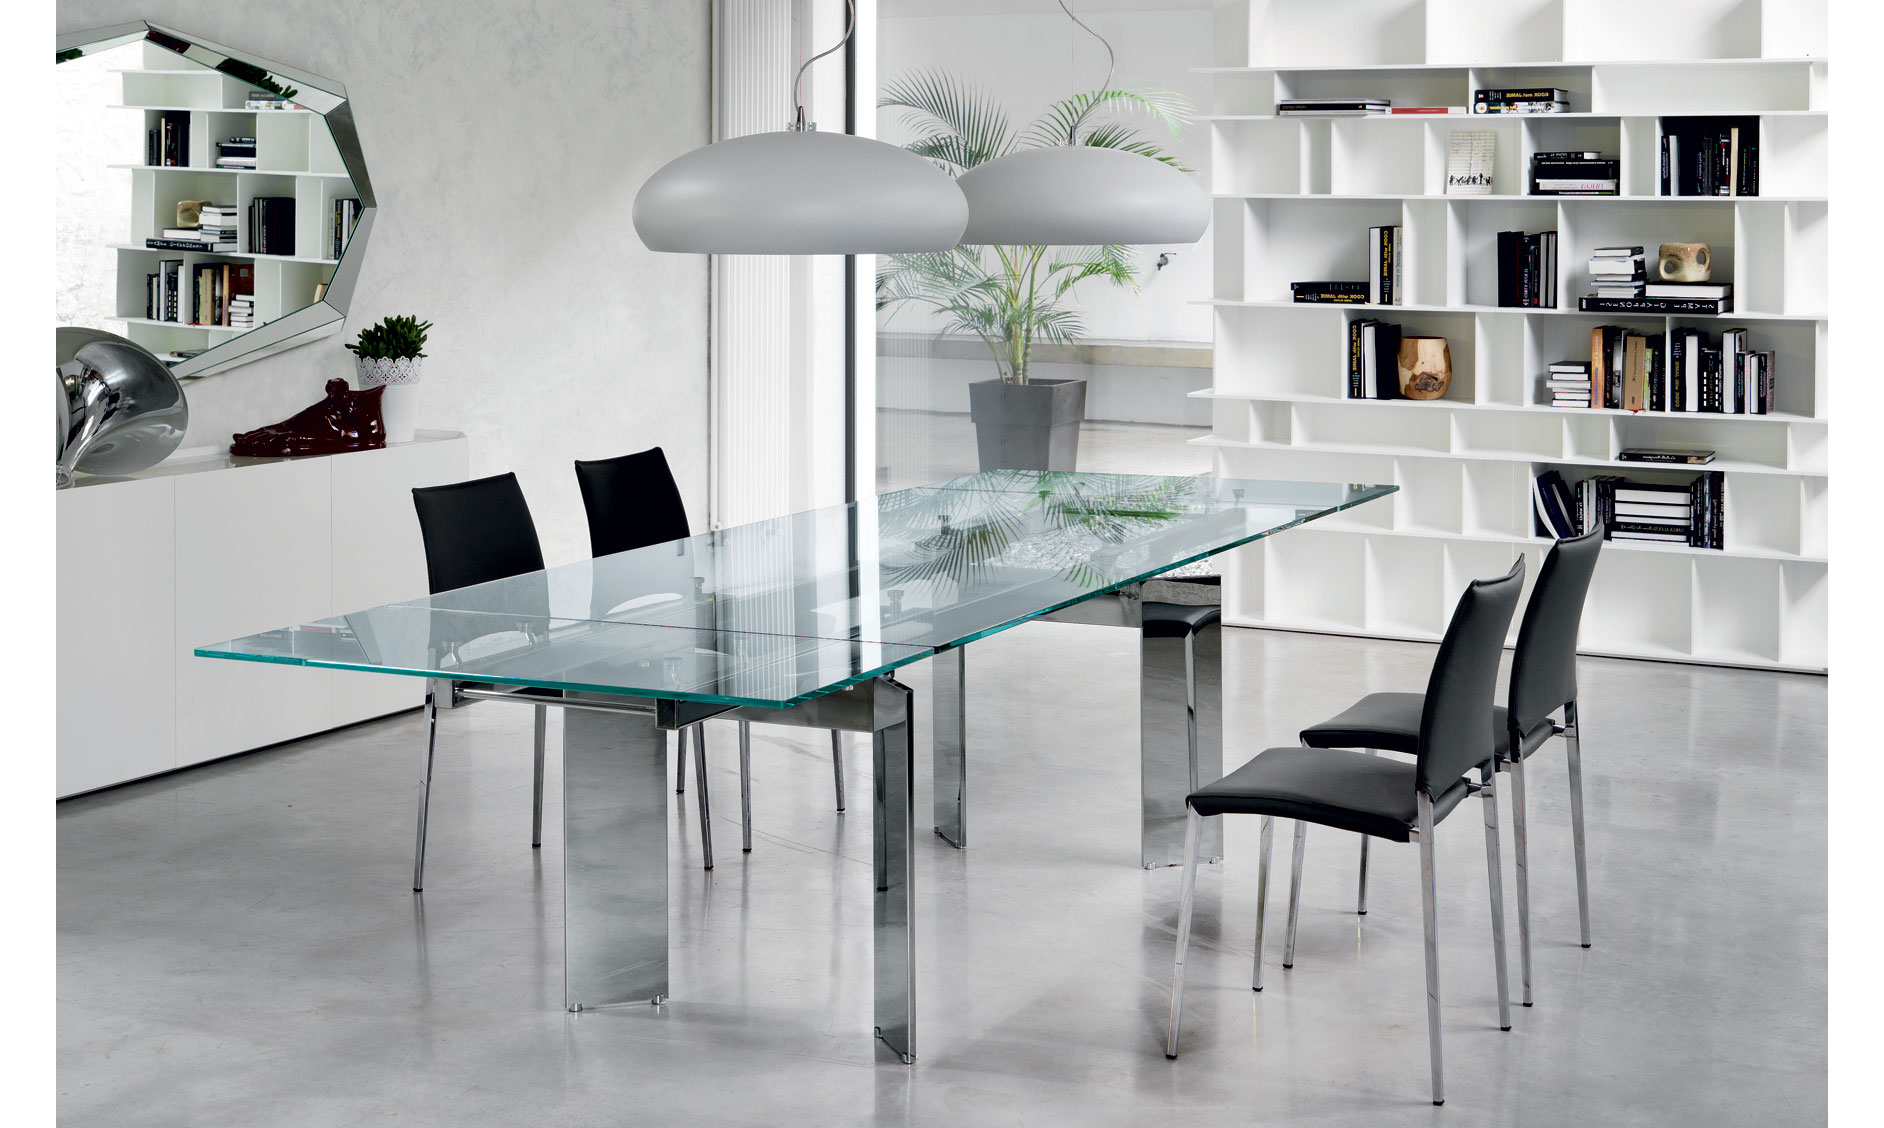 Mesa de comedor extensible elan cattelan de lujo en for Tu muebles catalogo